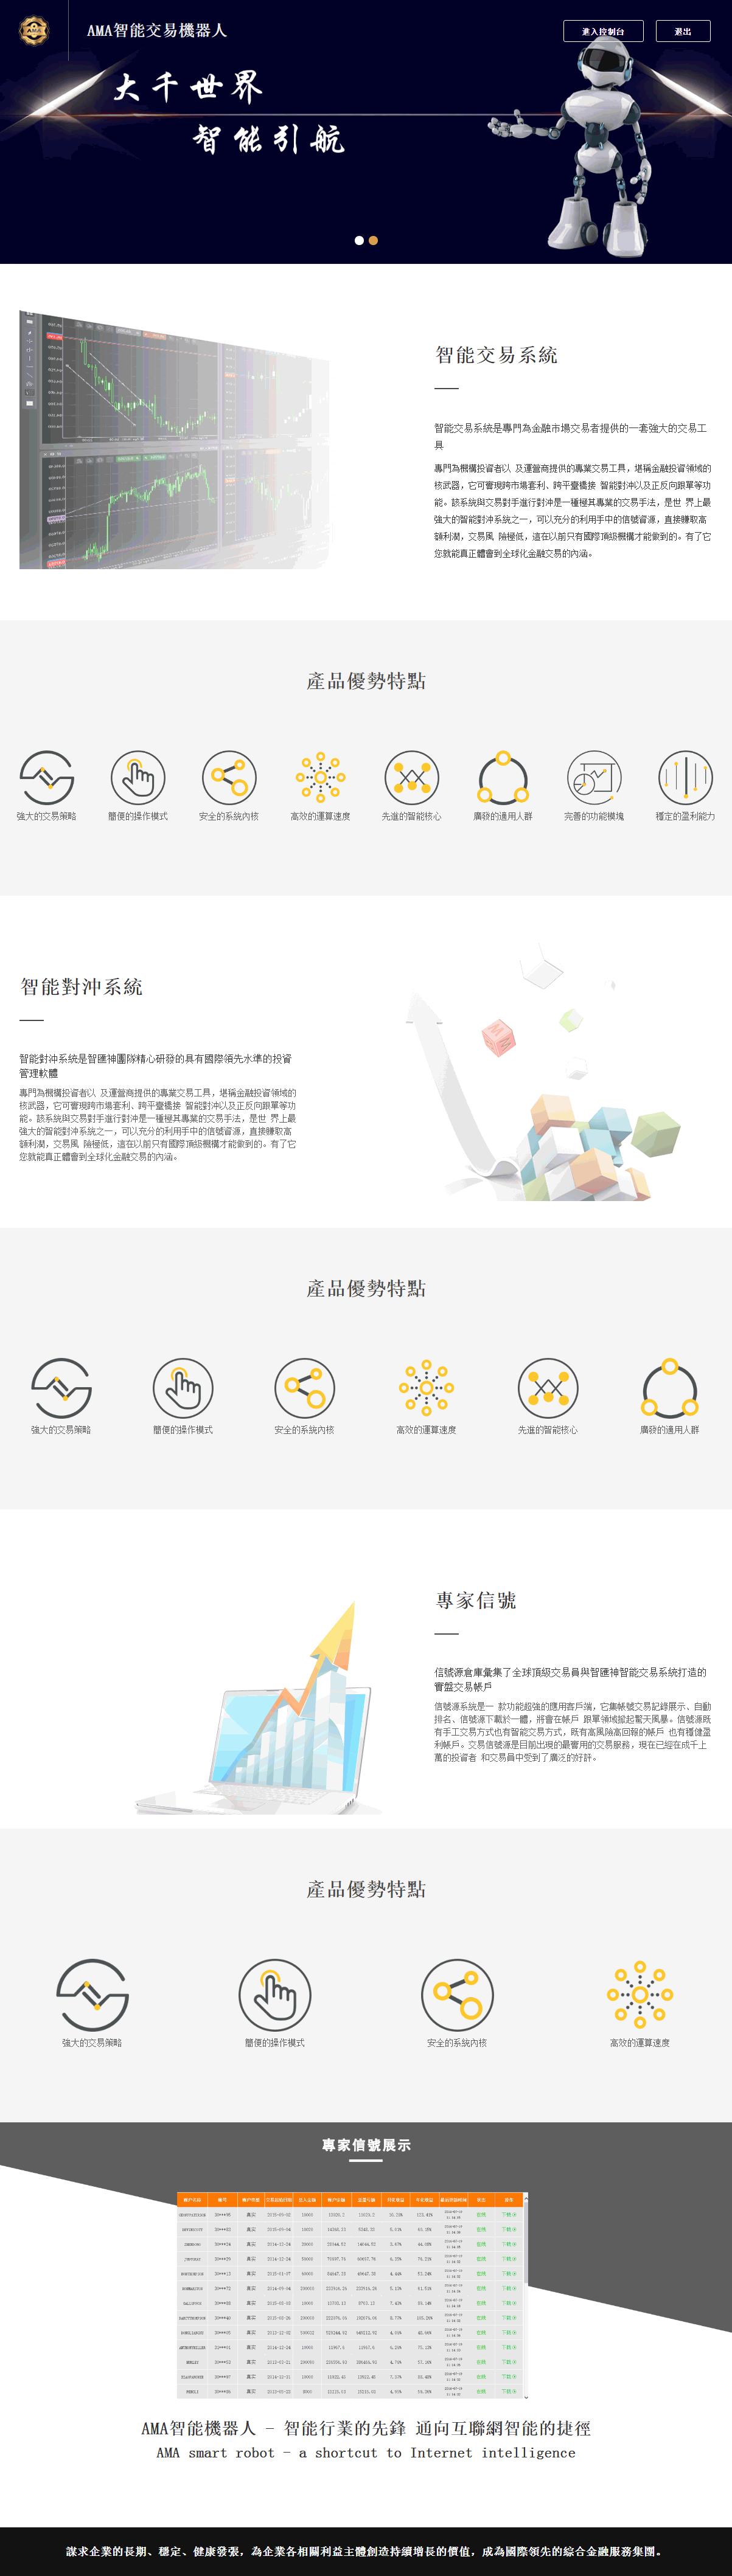 Thinkphp开发的会员管理系统,竞价单页面展示网站系统